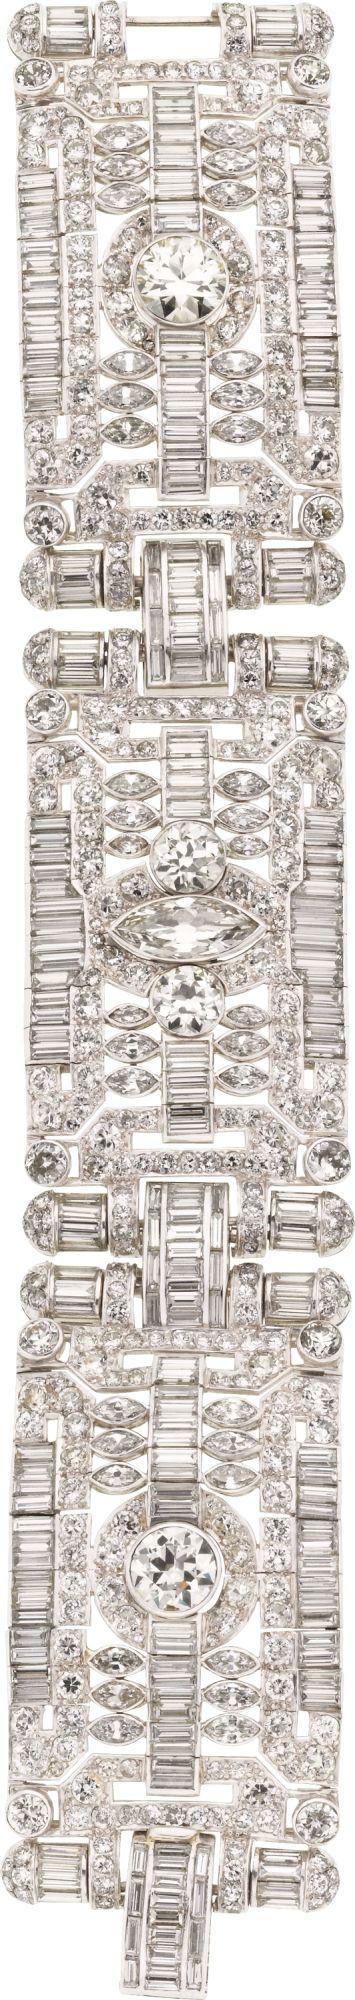 Luxury Estate Platinum Diamond Bracelet. |Classy & Elegant | @nyrockphotogirl